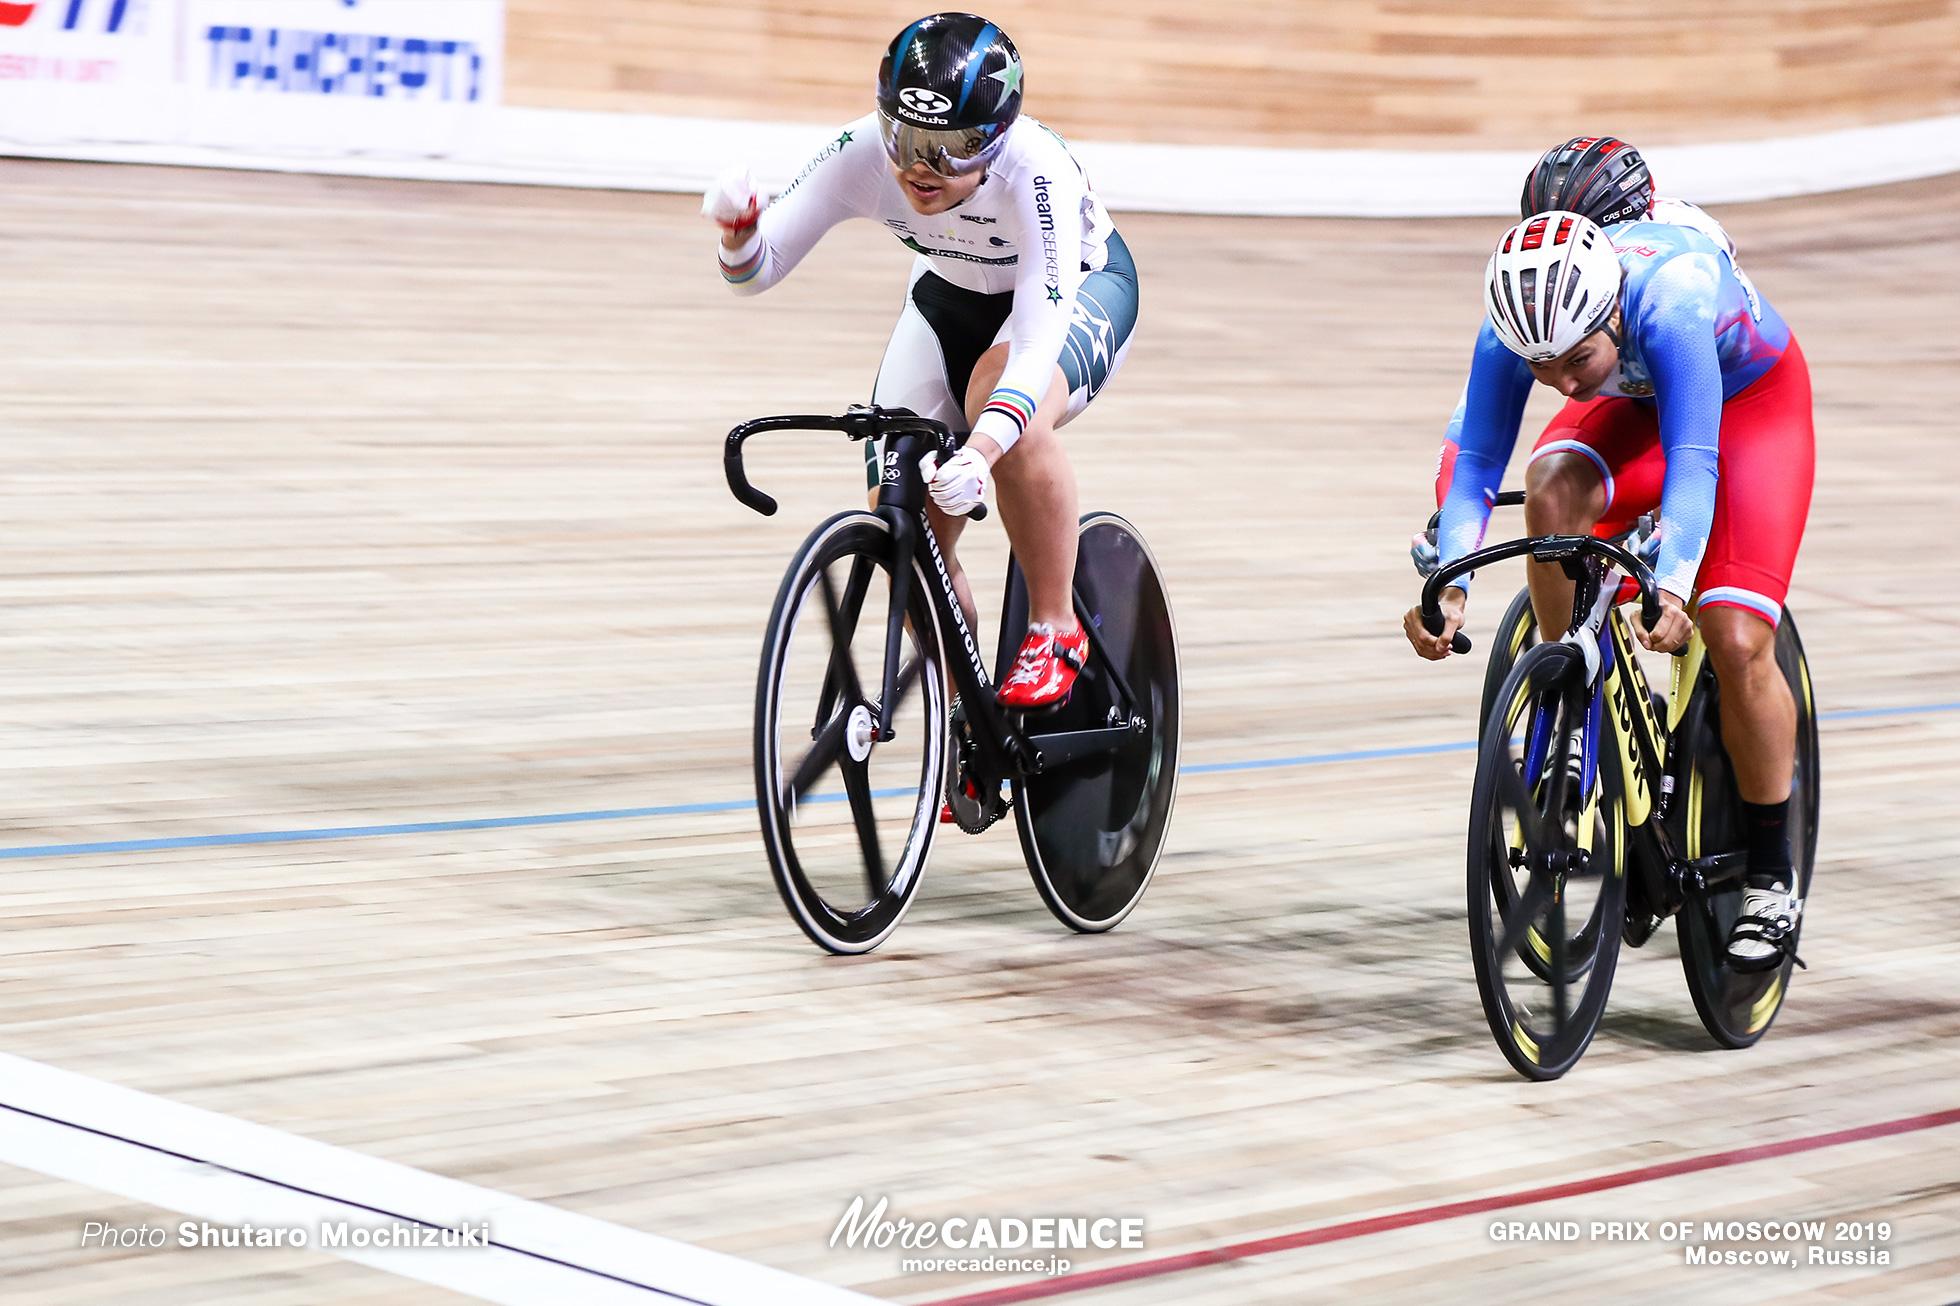 Final / Women's Keirin / GRAND PRIX OF MOSCOW 2019